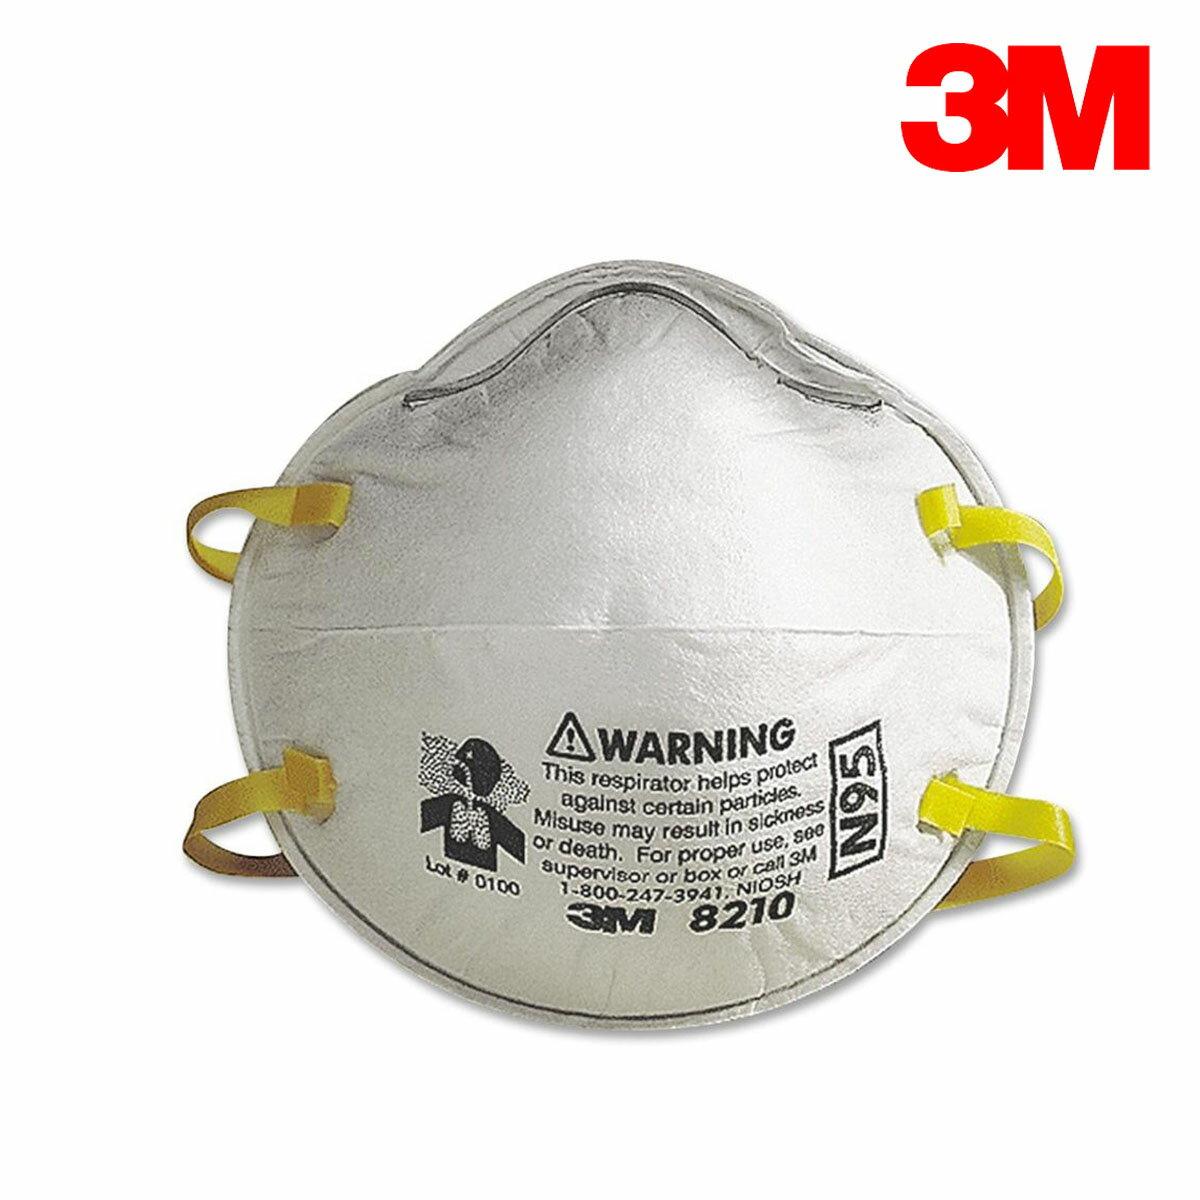 3M N95 8210口罩 單個1入 過濾粉塵 呼吸防護/工業用 2盒免運 可7-11取貨付款 Safetylite